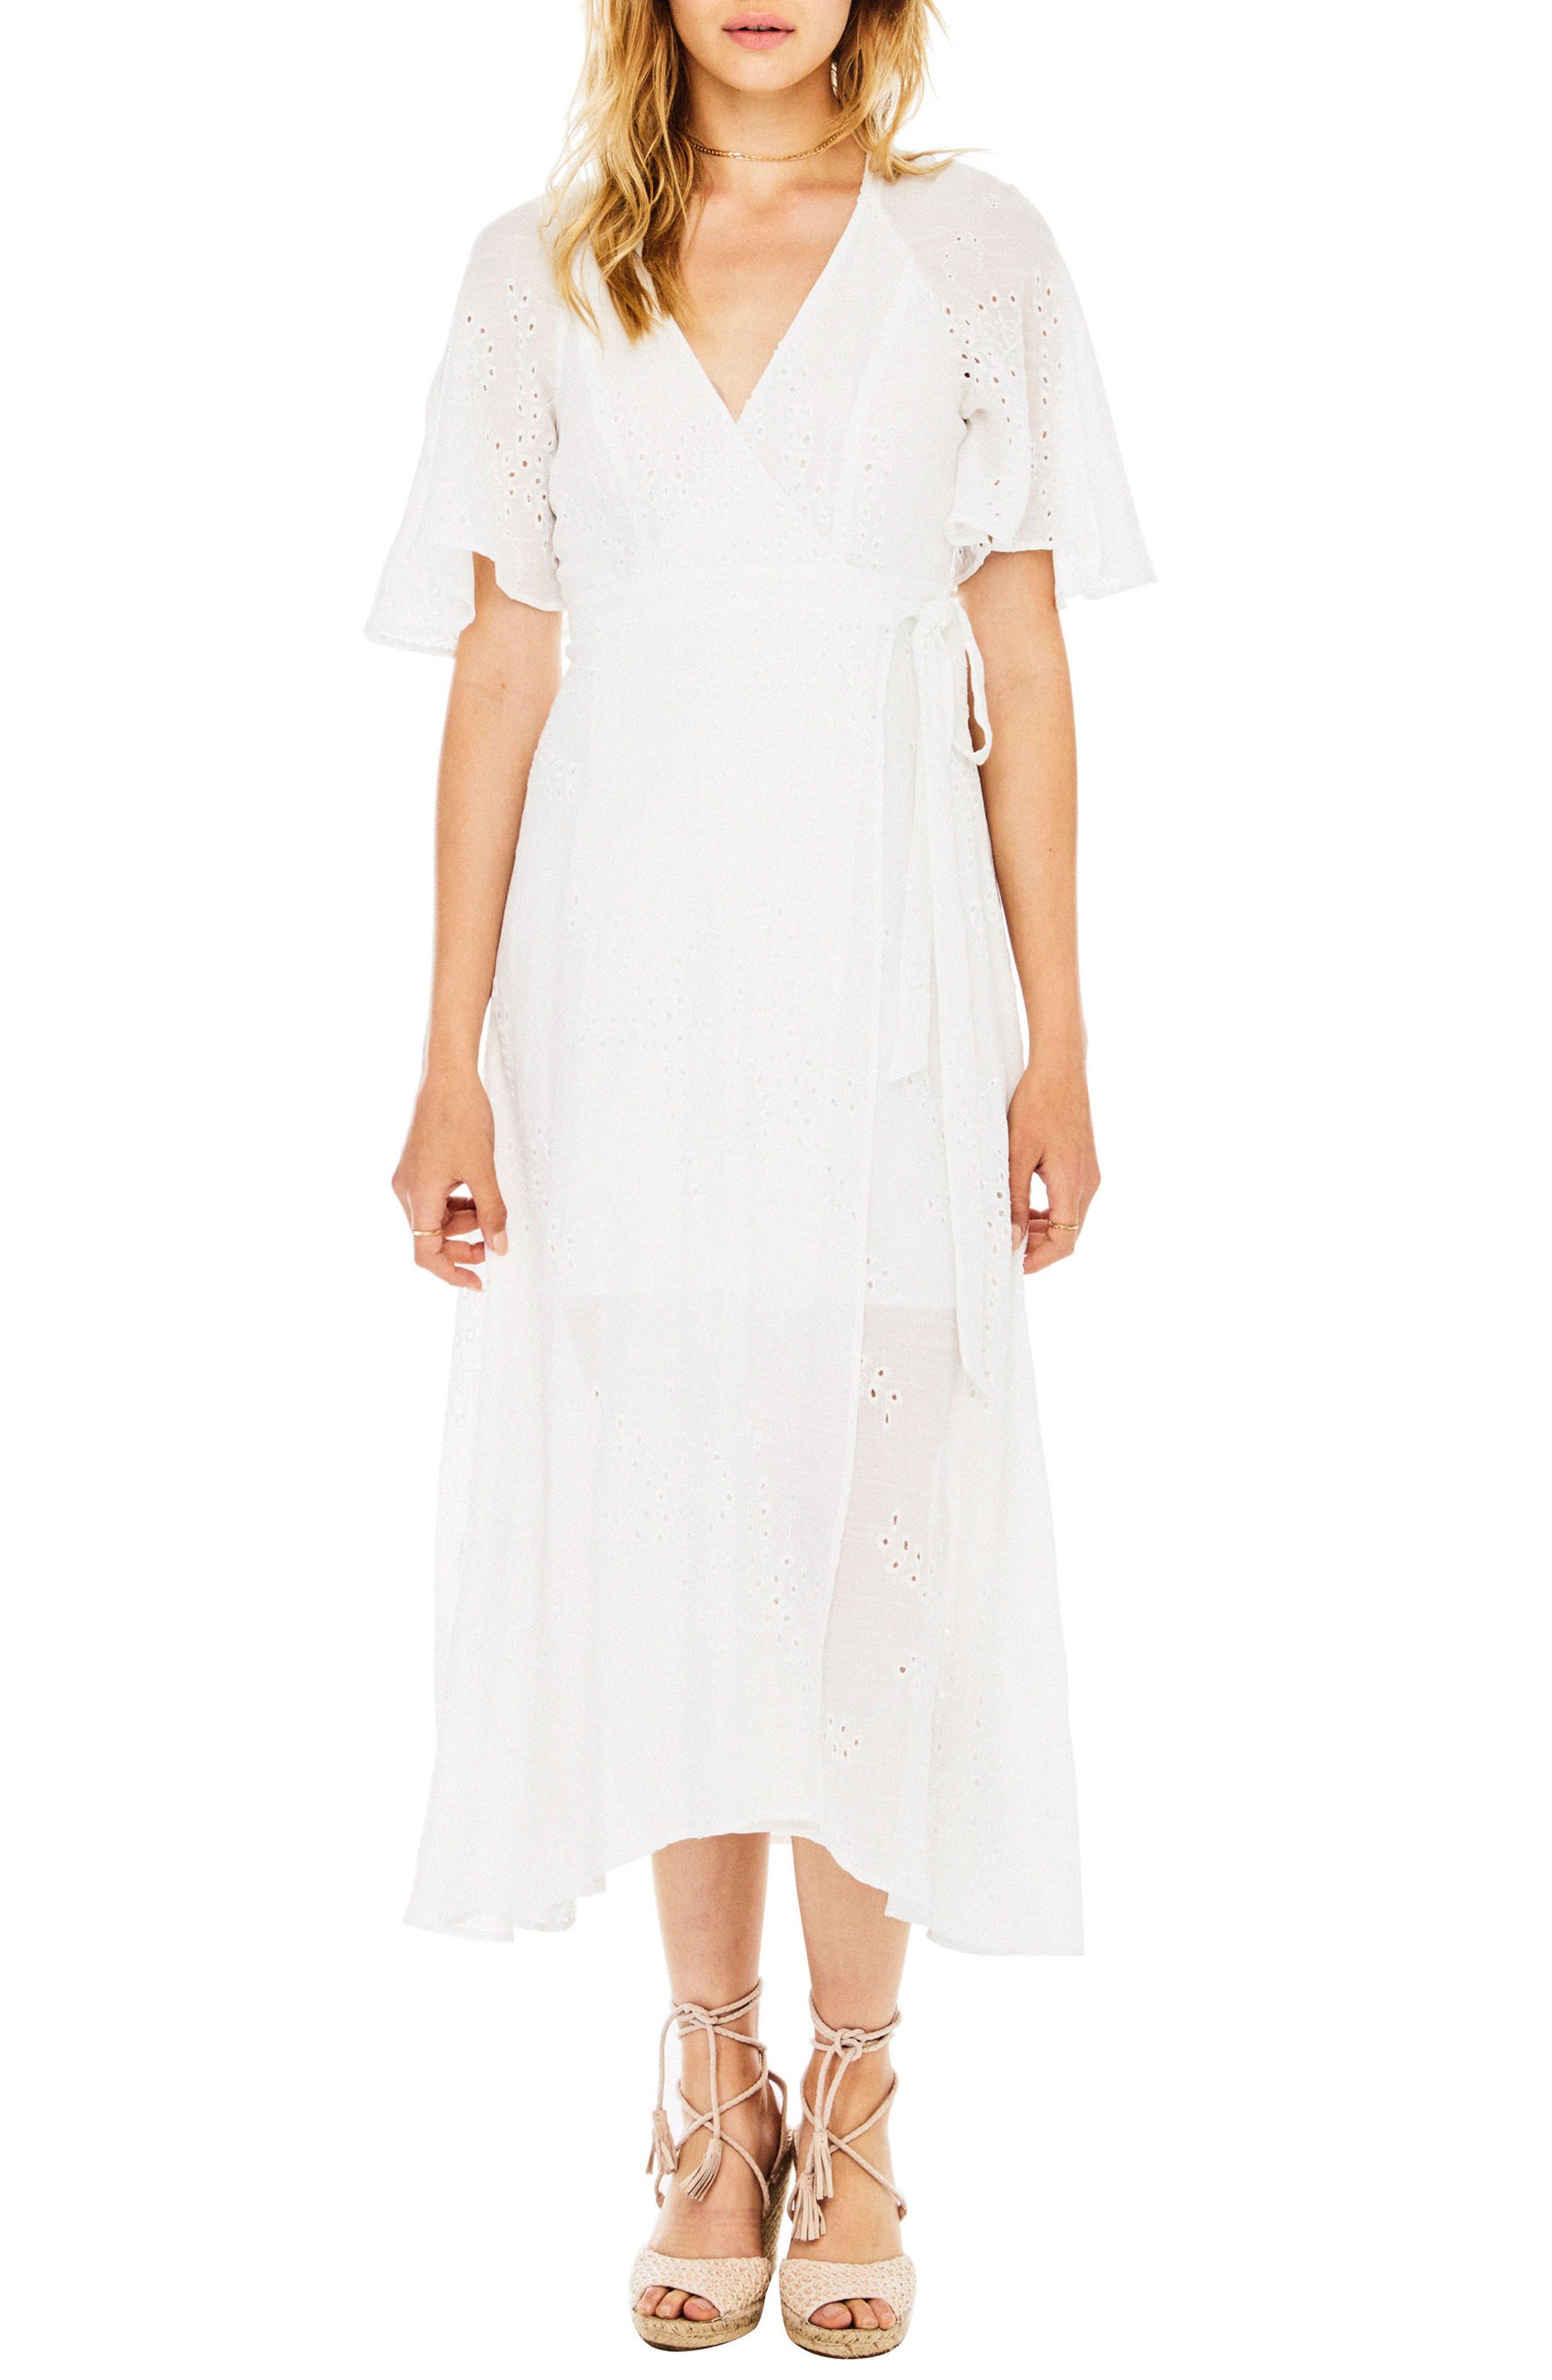 Alternate Image 1 Selected - ASTR the Label Gretchen Eyelet Wrap Dress